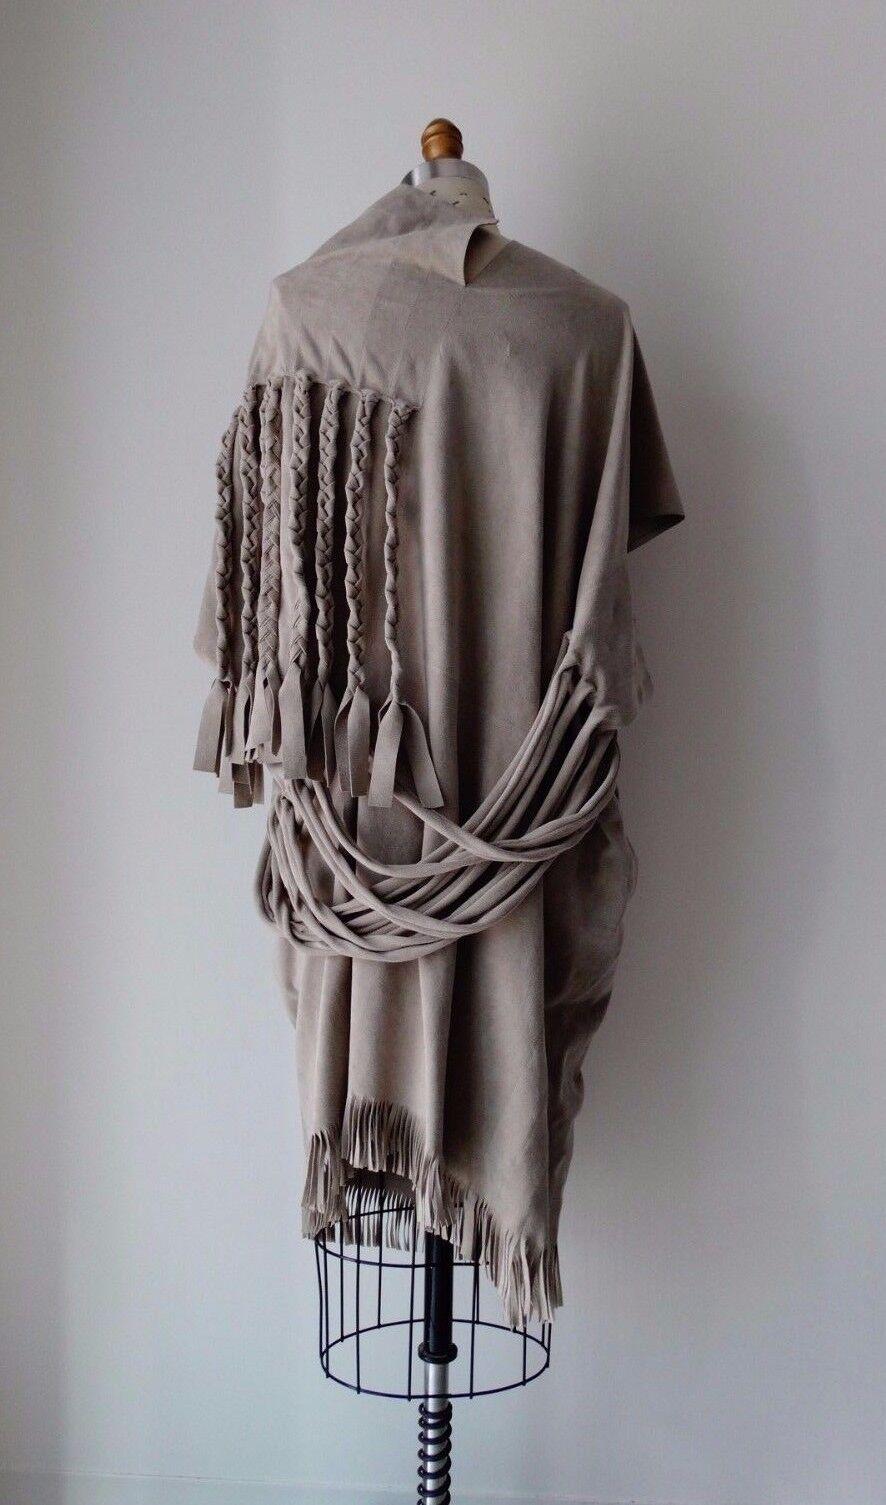 Junya Watanabe Beige Faux Suede Fringe & Braid Embellished Dress Sz S